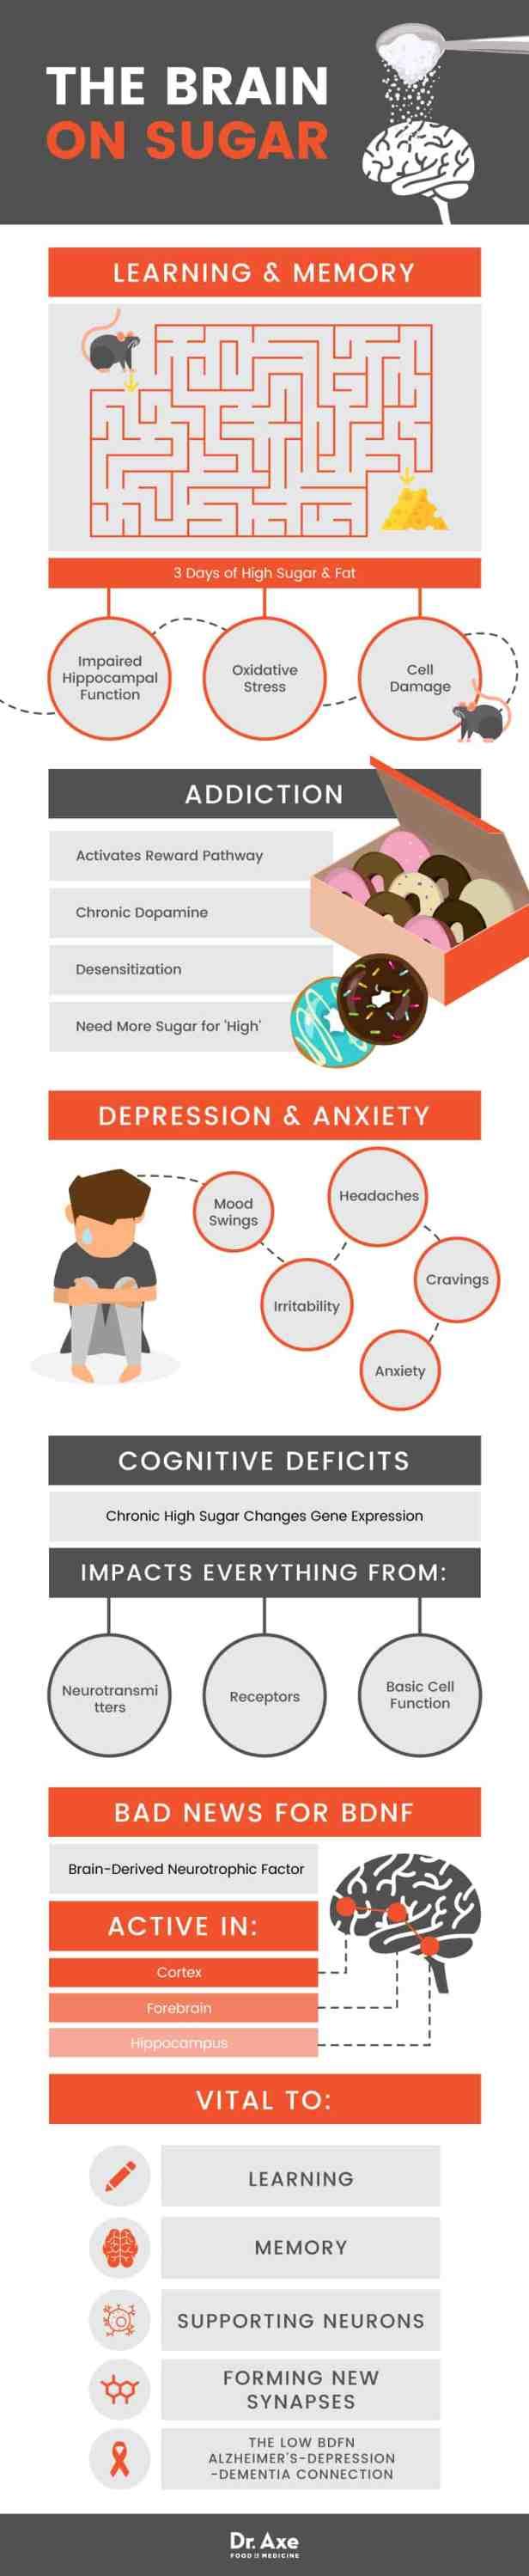 Your brain on sugar - Dr. Axe